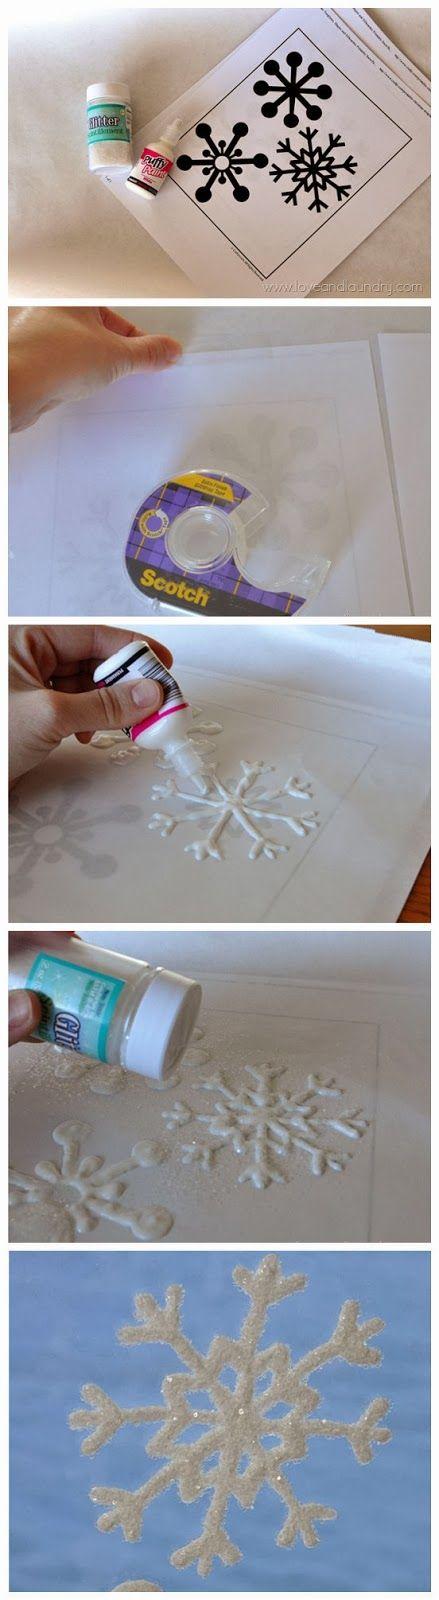 DIY Glitter Snowflake Window Clings.